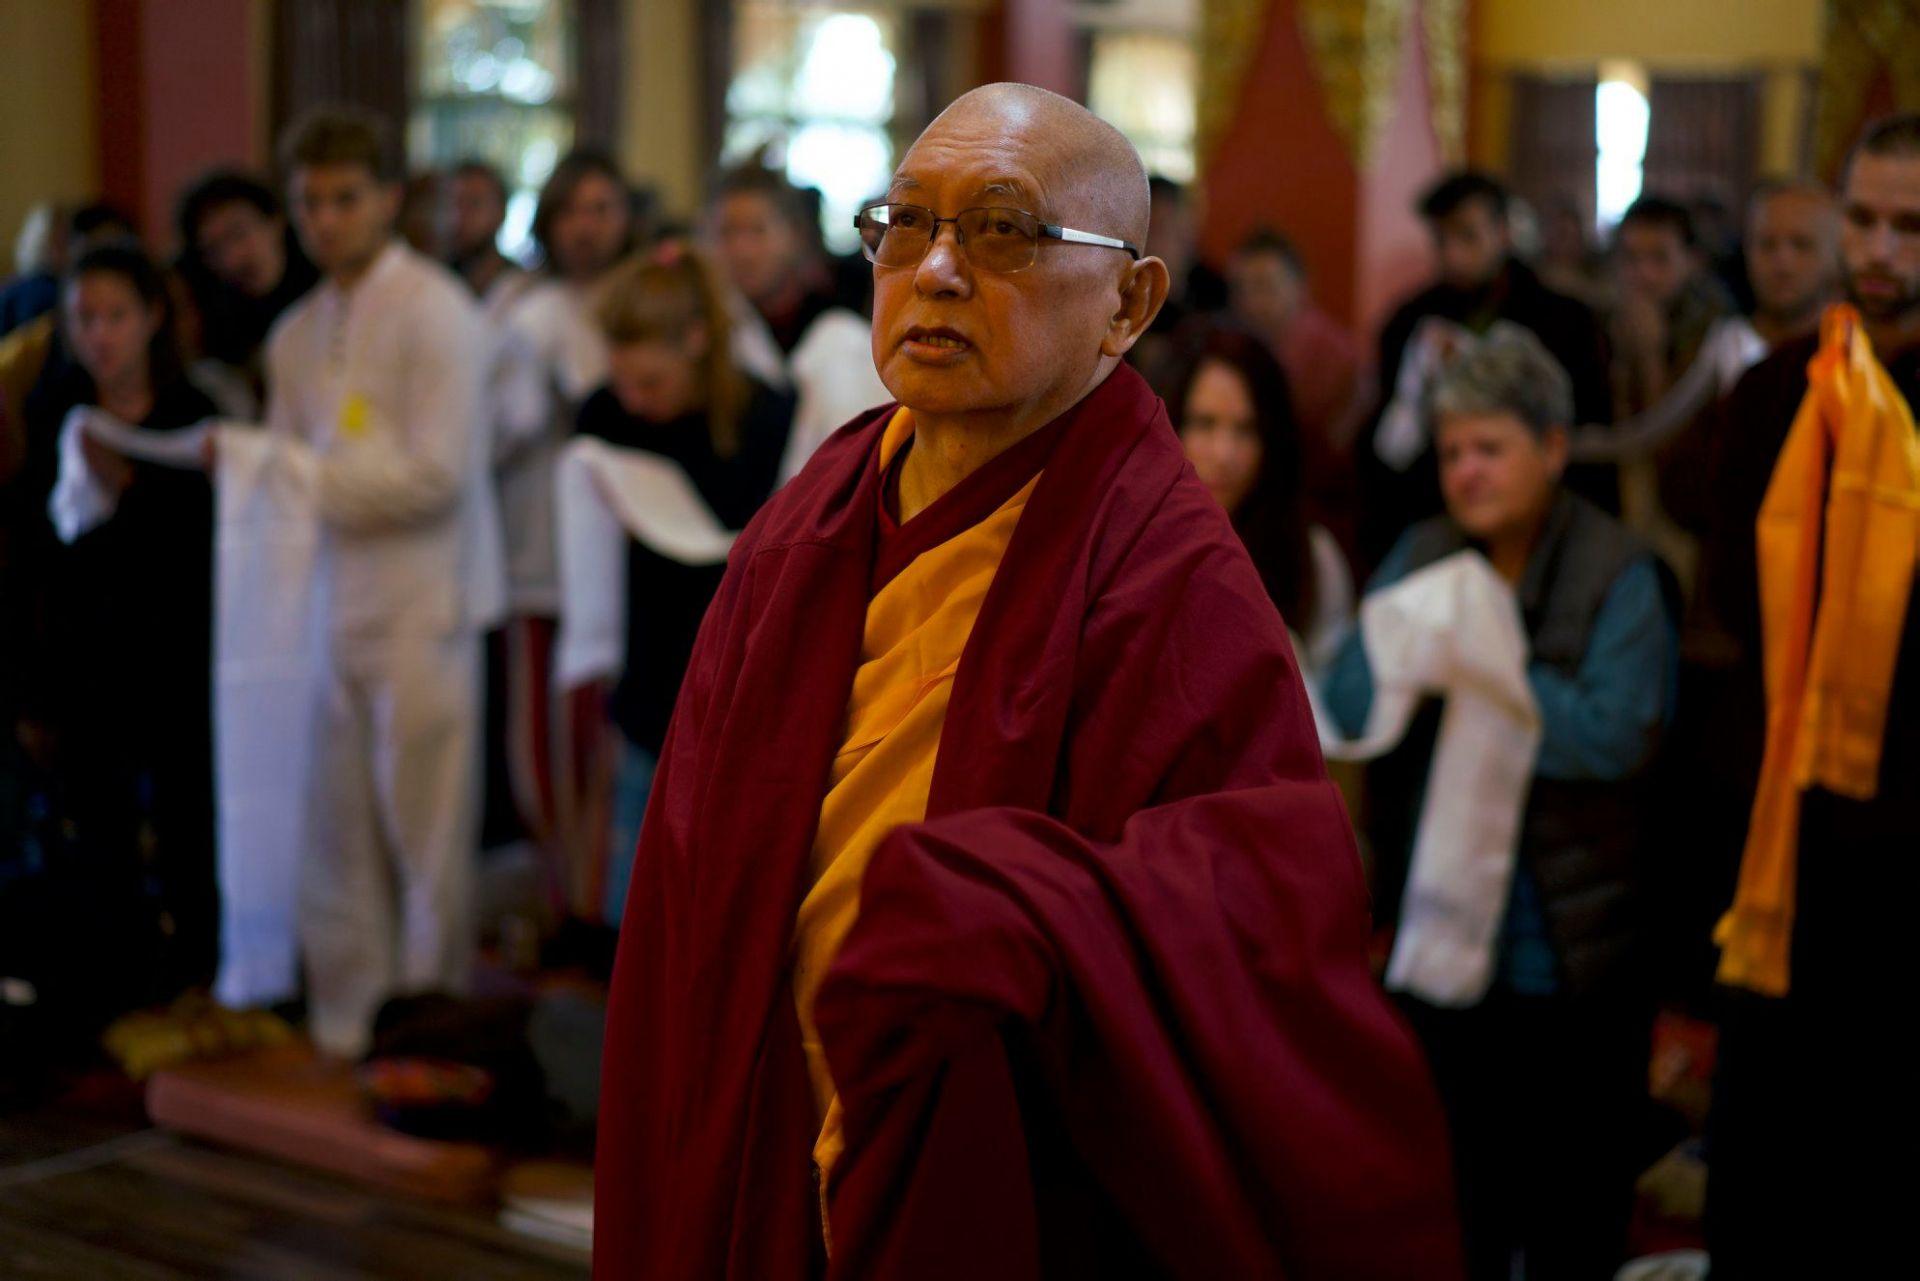 Watch Lama Zopa Rinpoche Teaching LIVE from Kopan Monastery